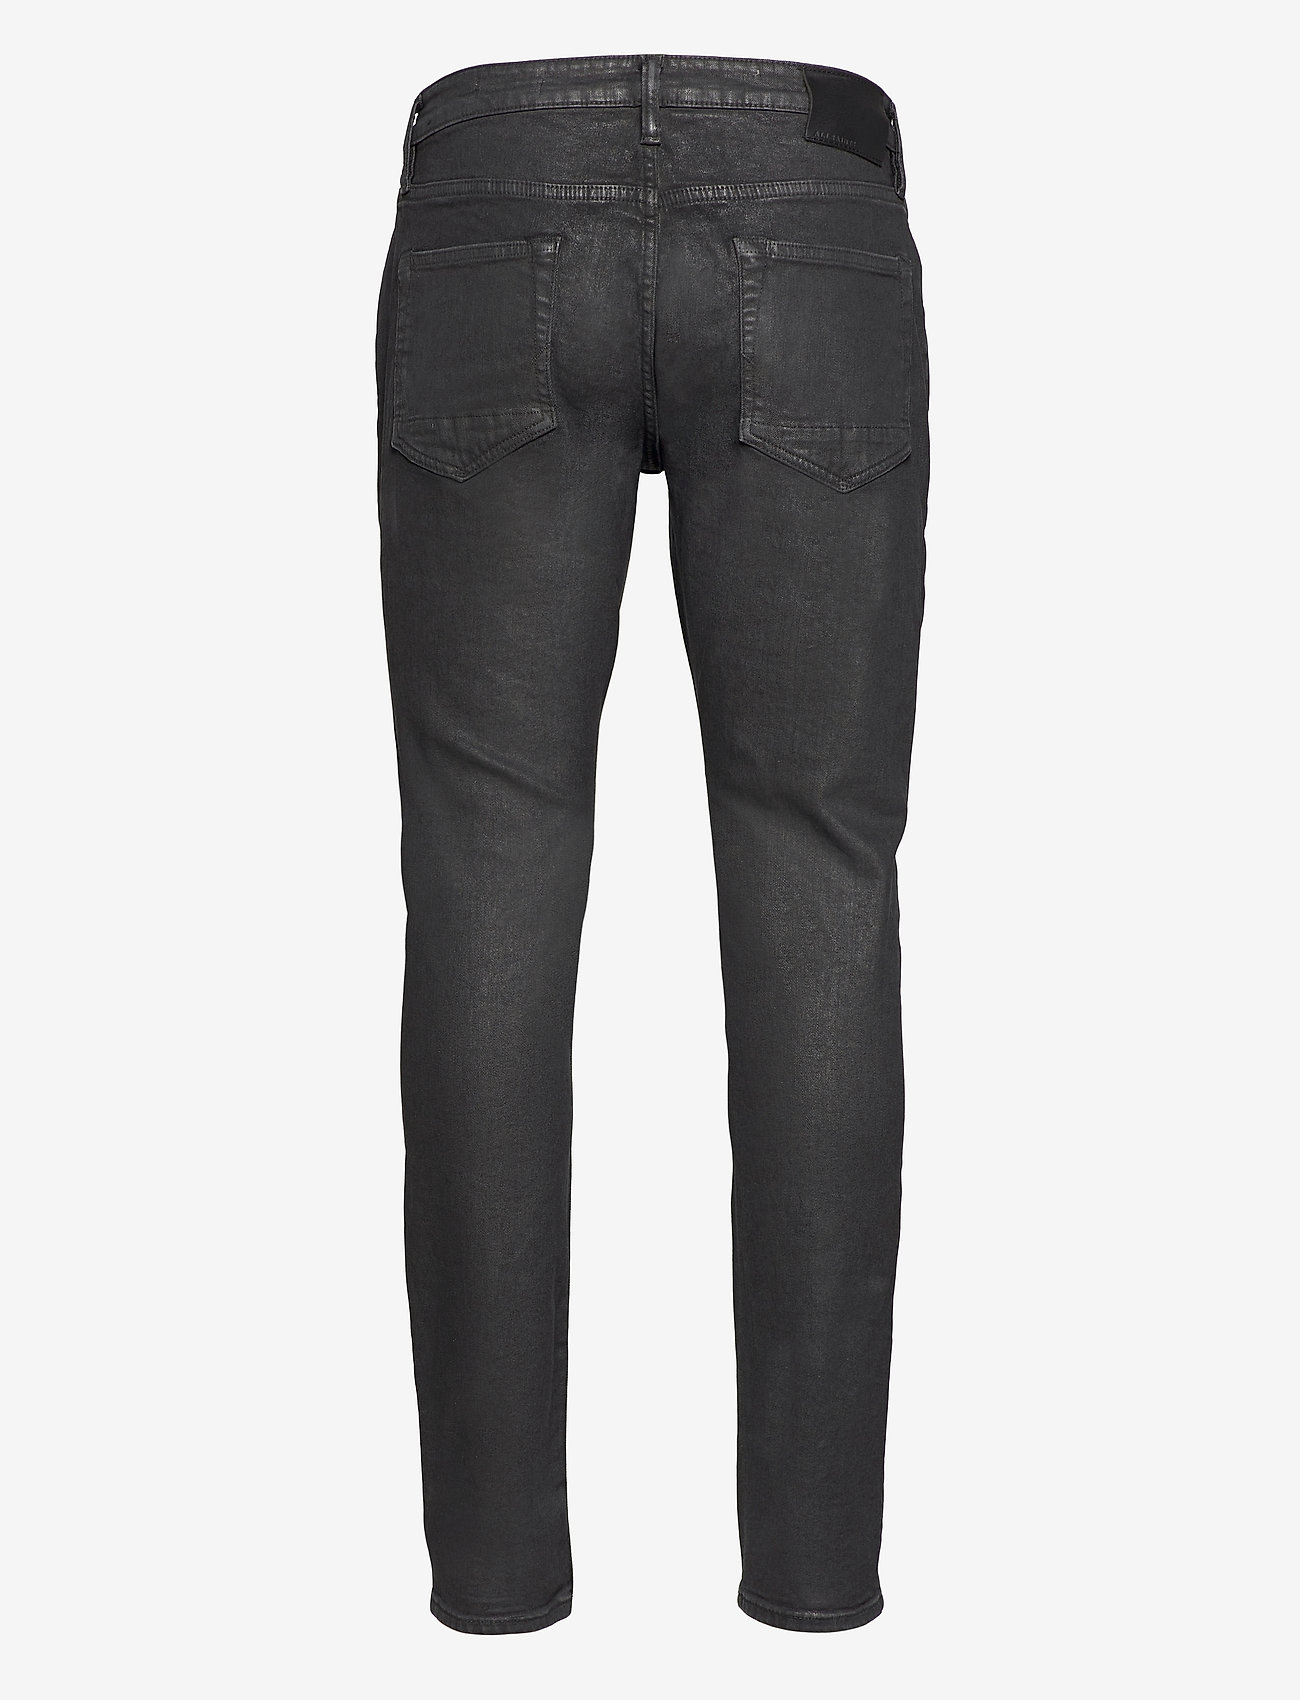 AllSaints - REX - regular jeans - black - 1